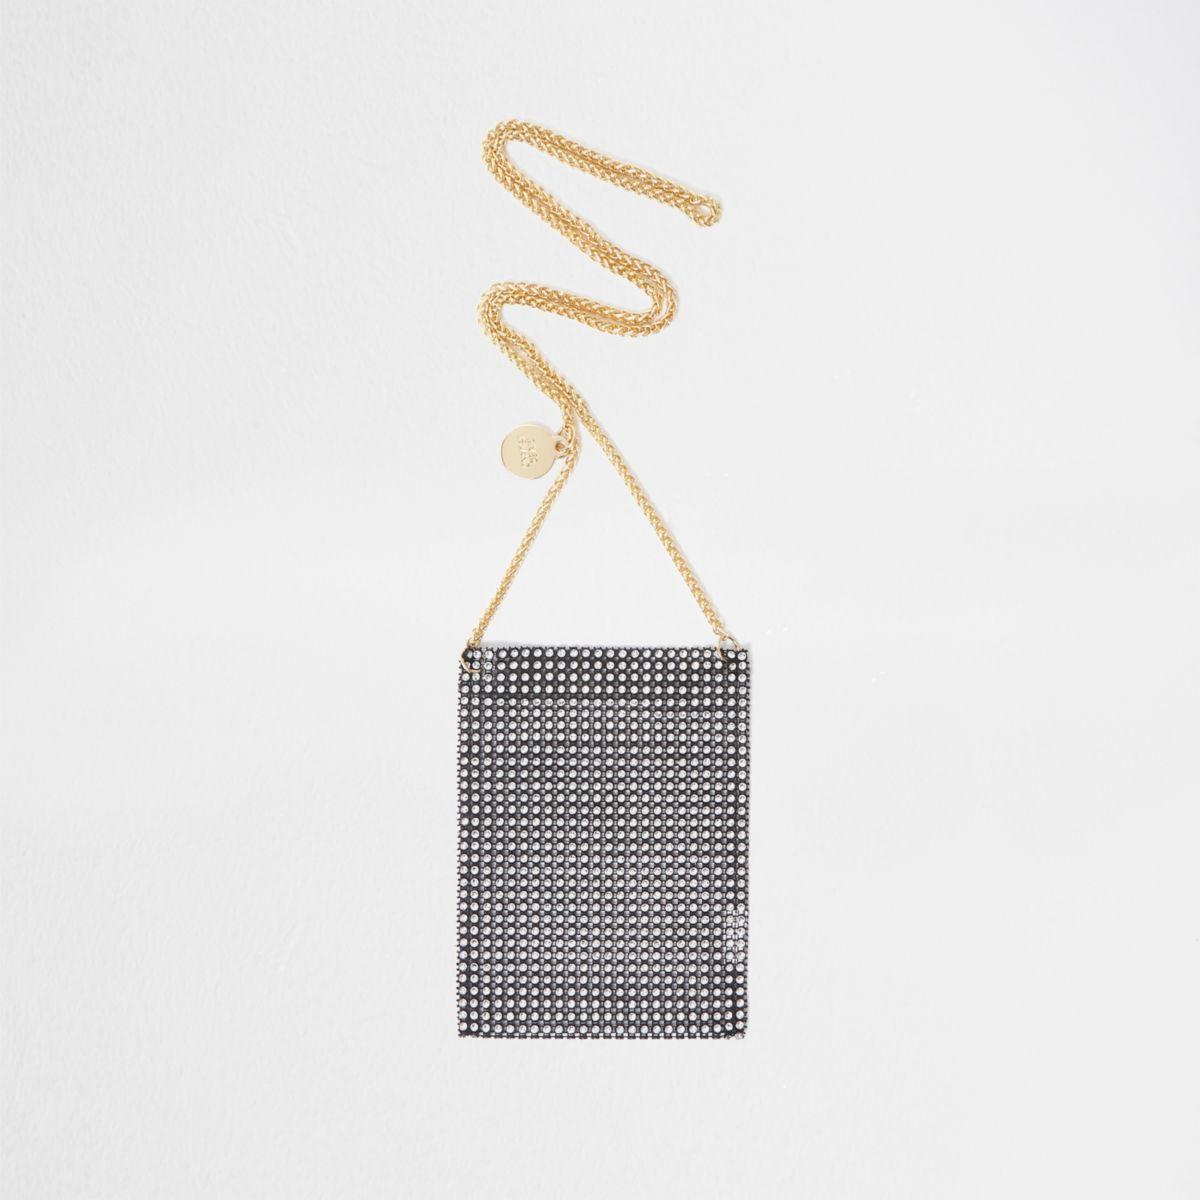 Black diamante cross body chain pouch bag